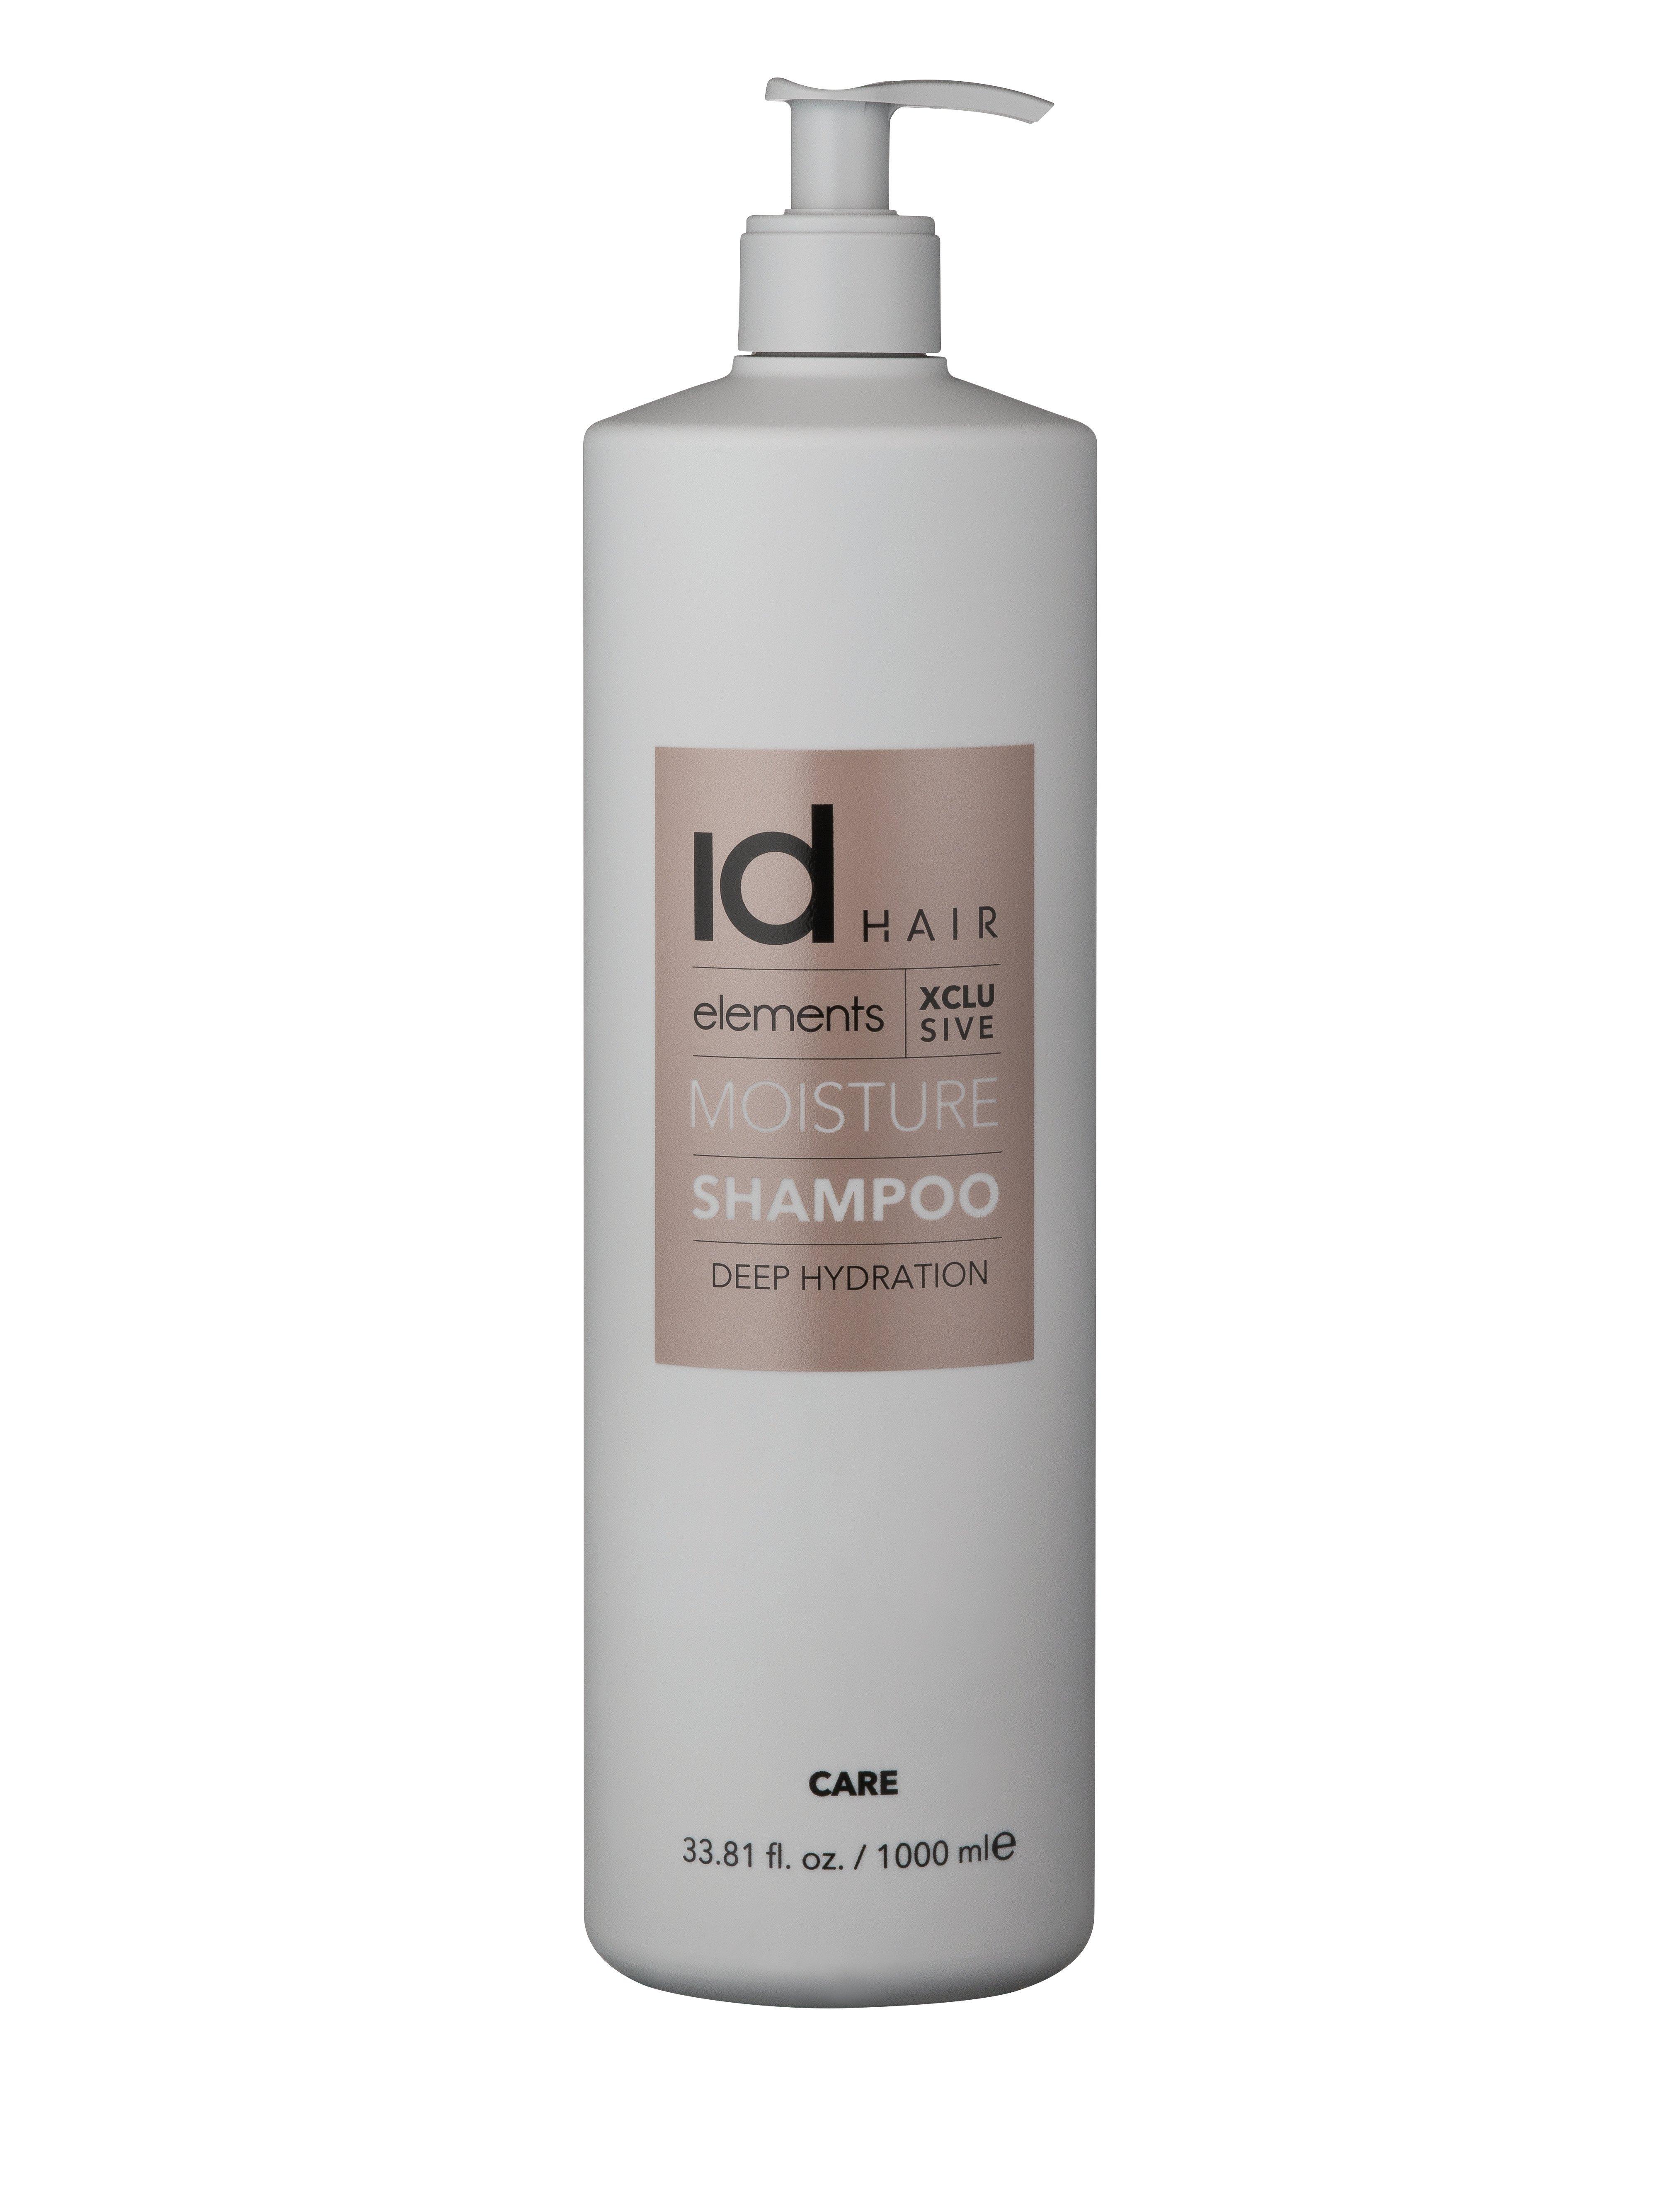 IdHAIR - Elements Xclusive Moisture Shampoo 1000 ml